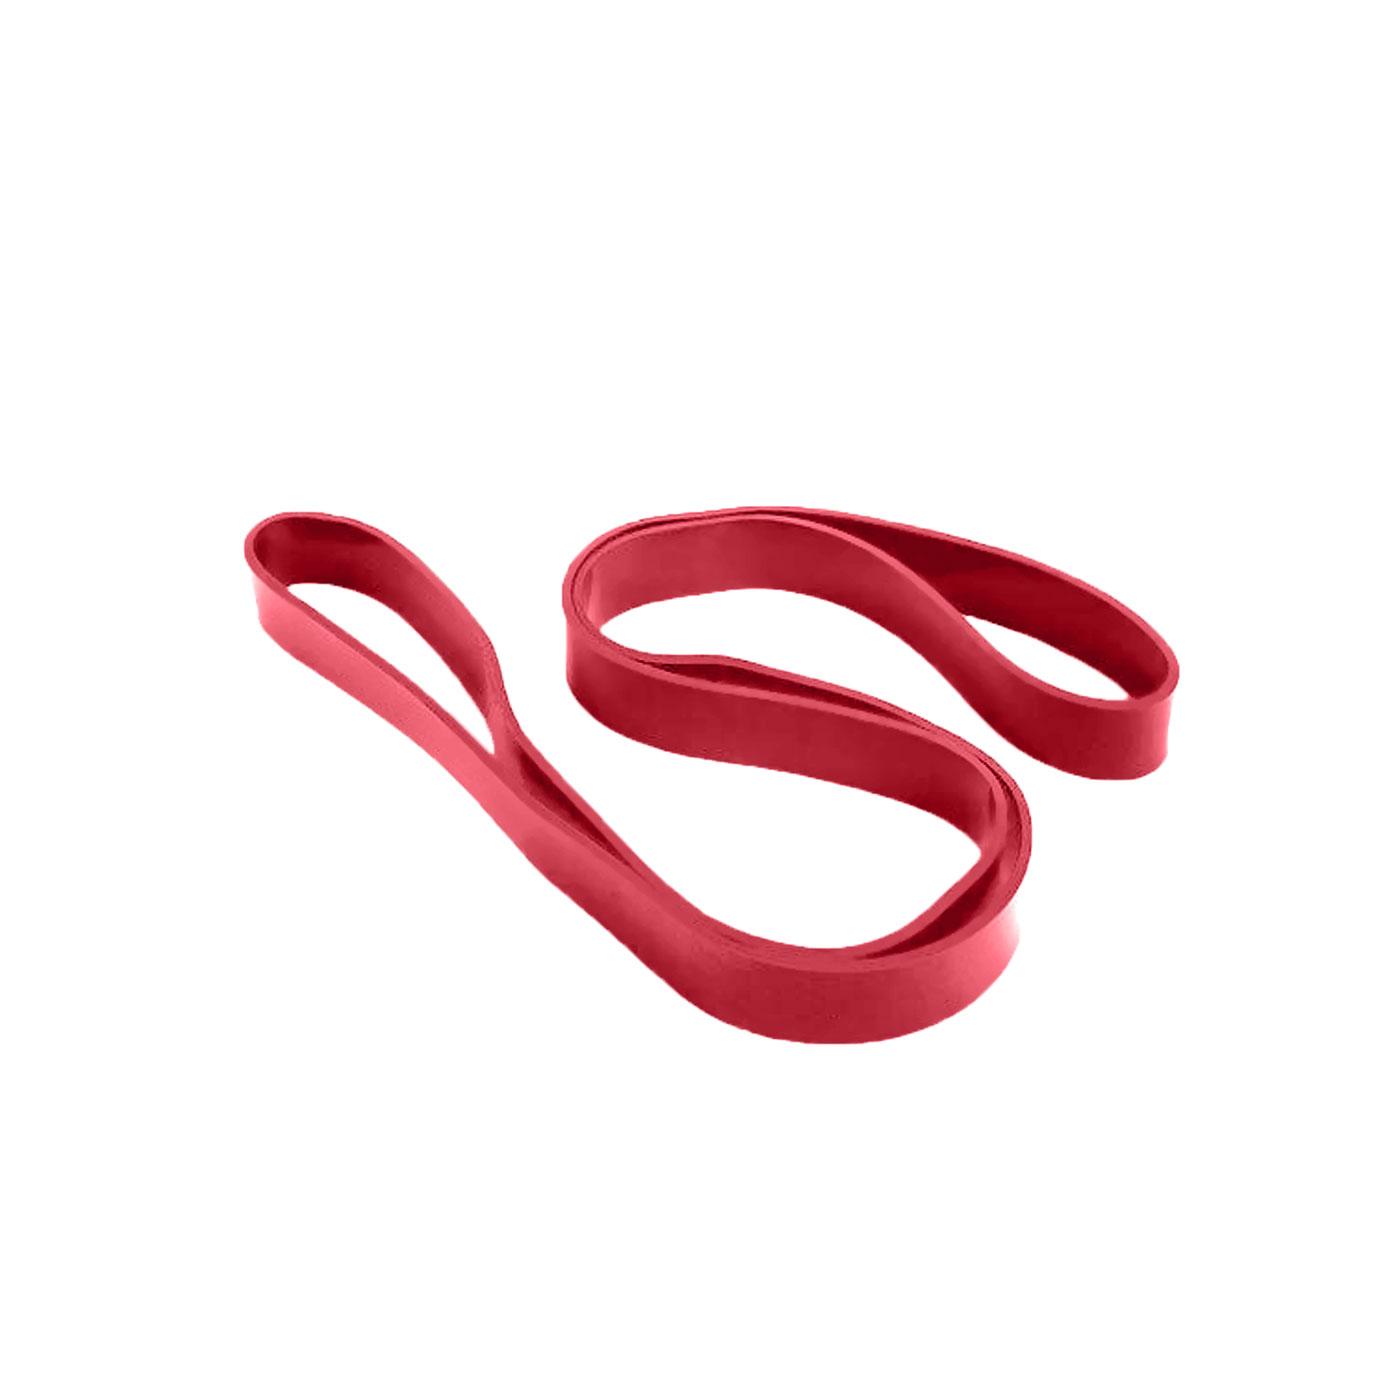 ALEX 大環狀乳膠阻力帶(中量級) C-5703 - 紅